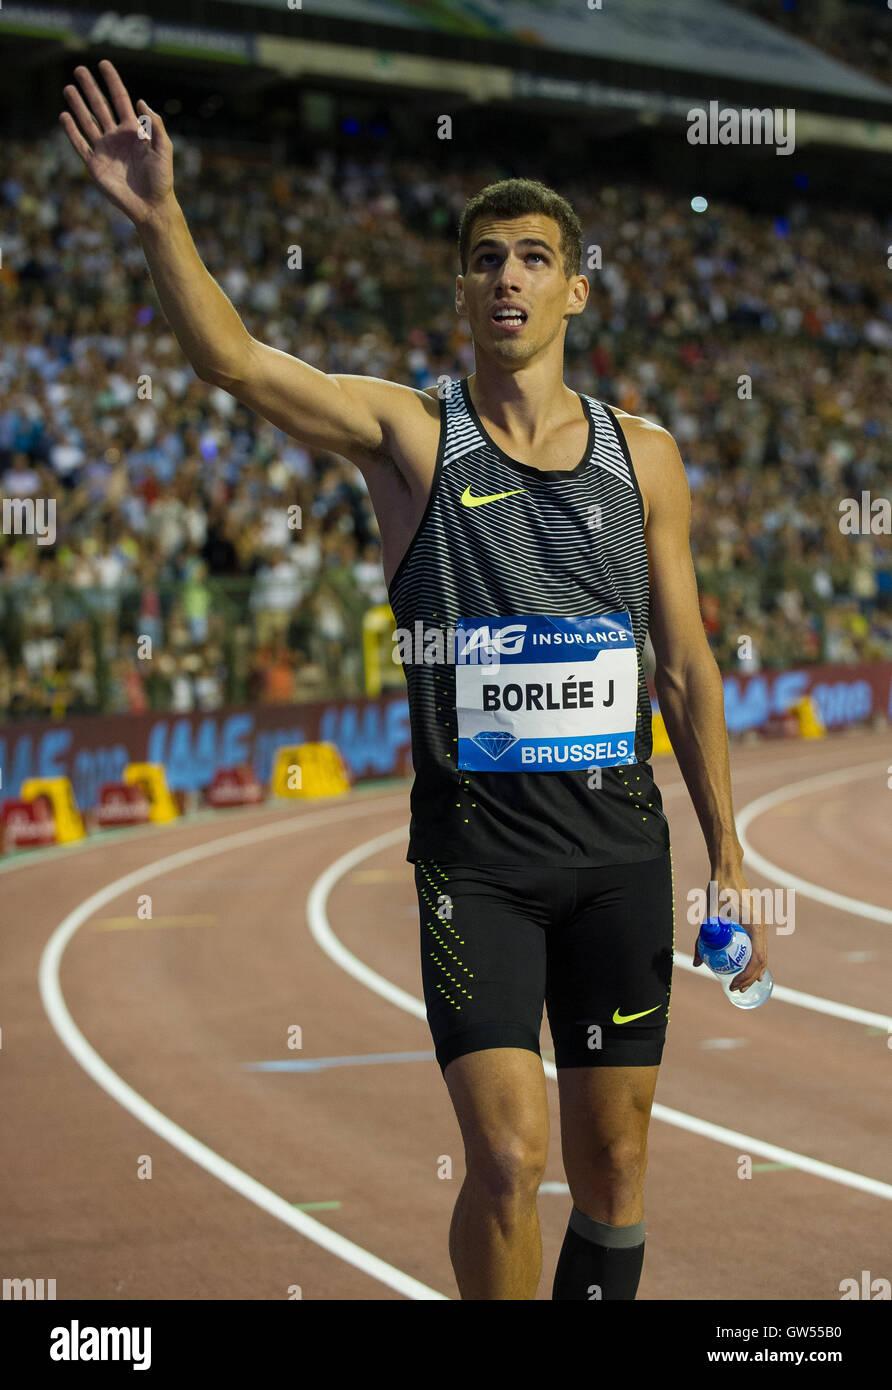 BRUSSELS, BELGIUM - SEPTEMBER 9: Jonathan Borlee scompeting in the Men's 400m at the AG Insurance Memorial Van - Stock Image